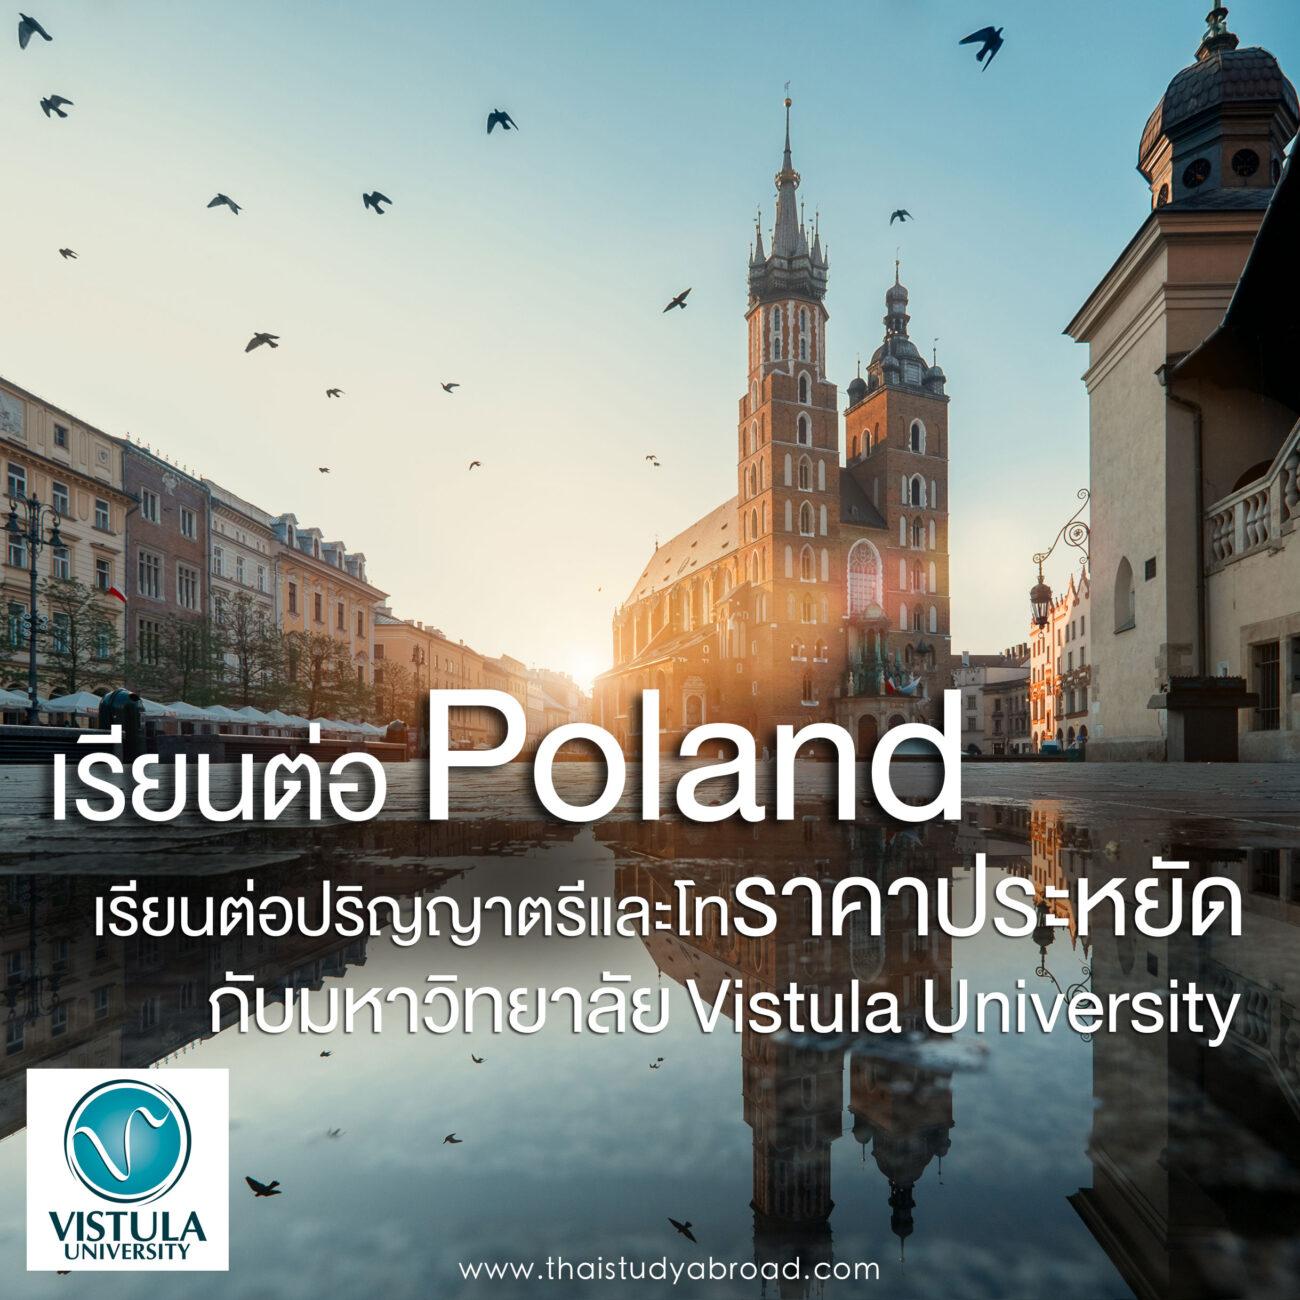 Vistular University